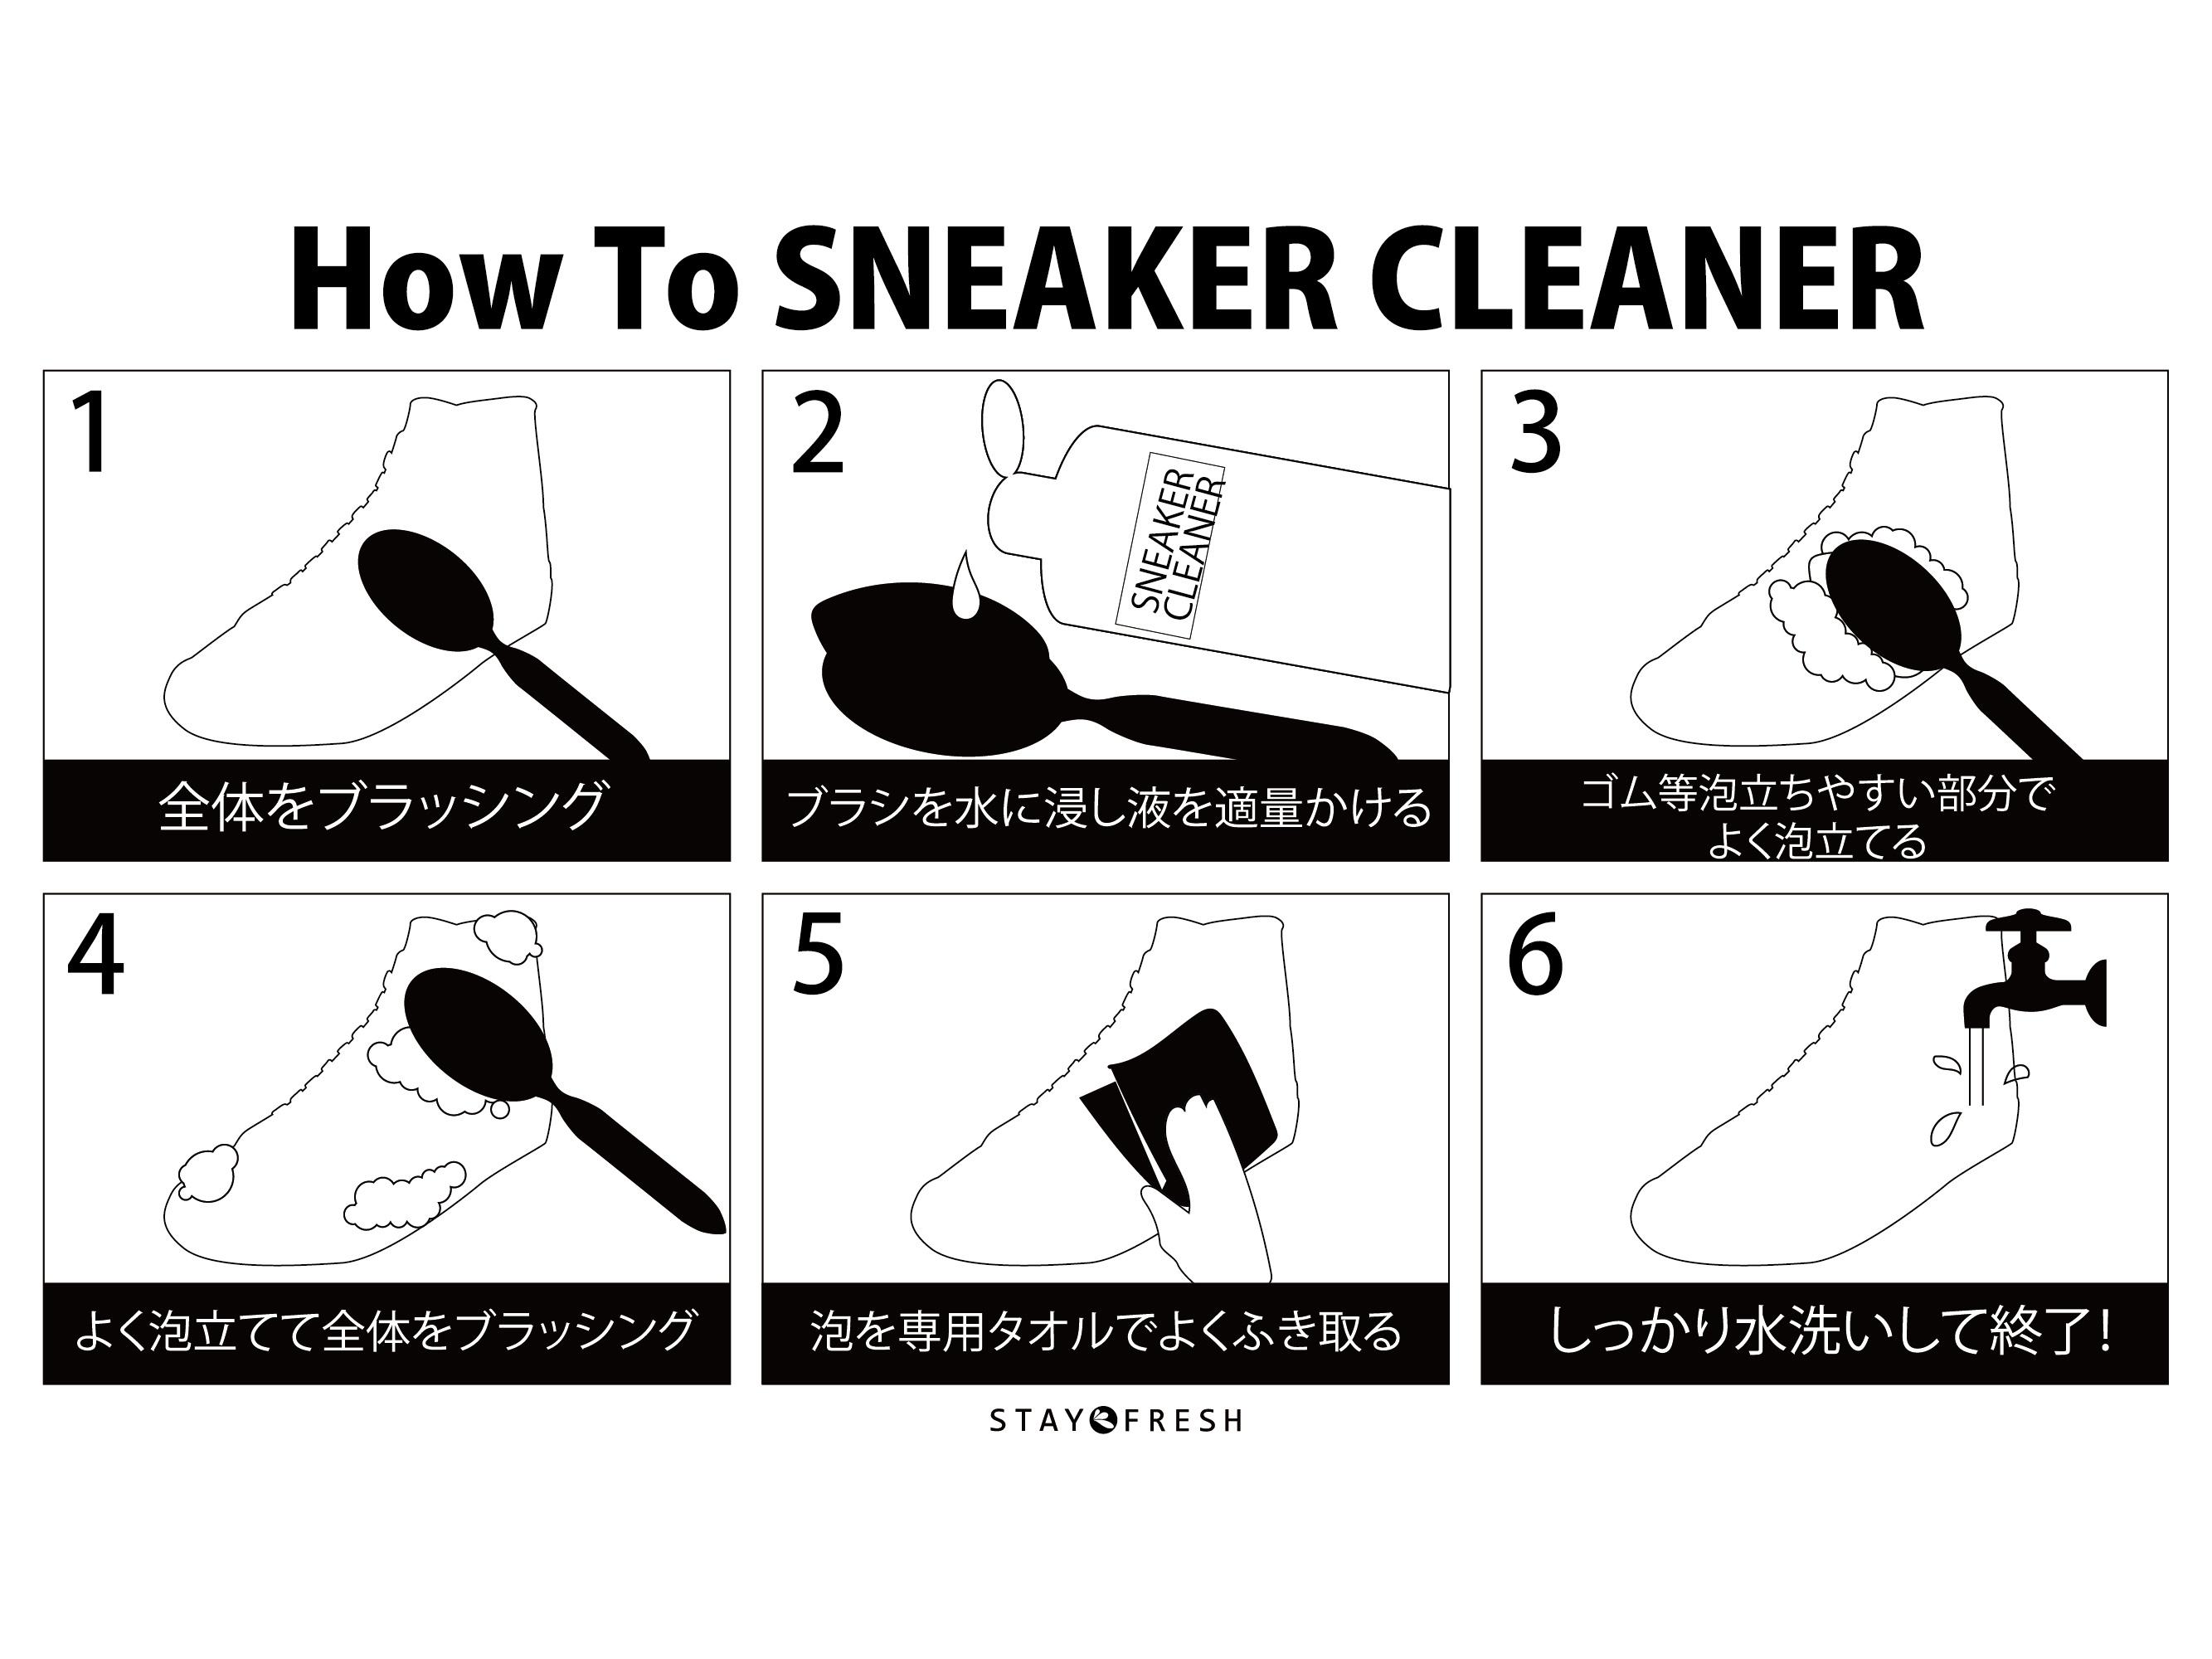 STAYFRESH SNEAKER CLEANER 3P SETの商品画像-4